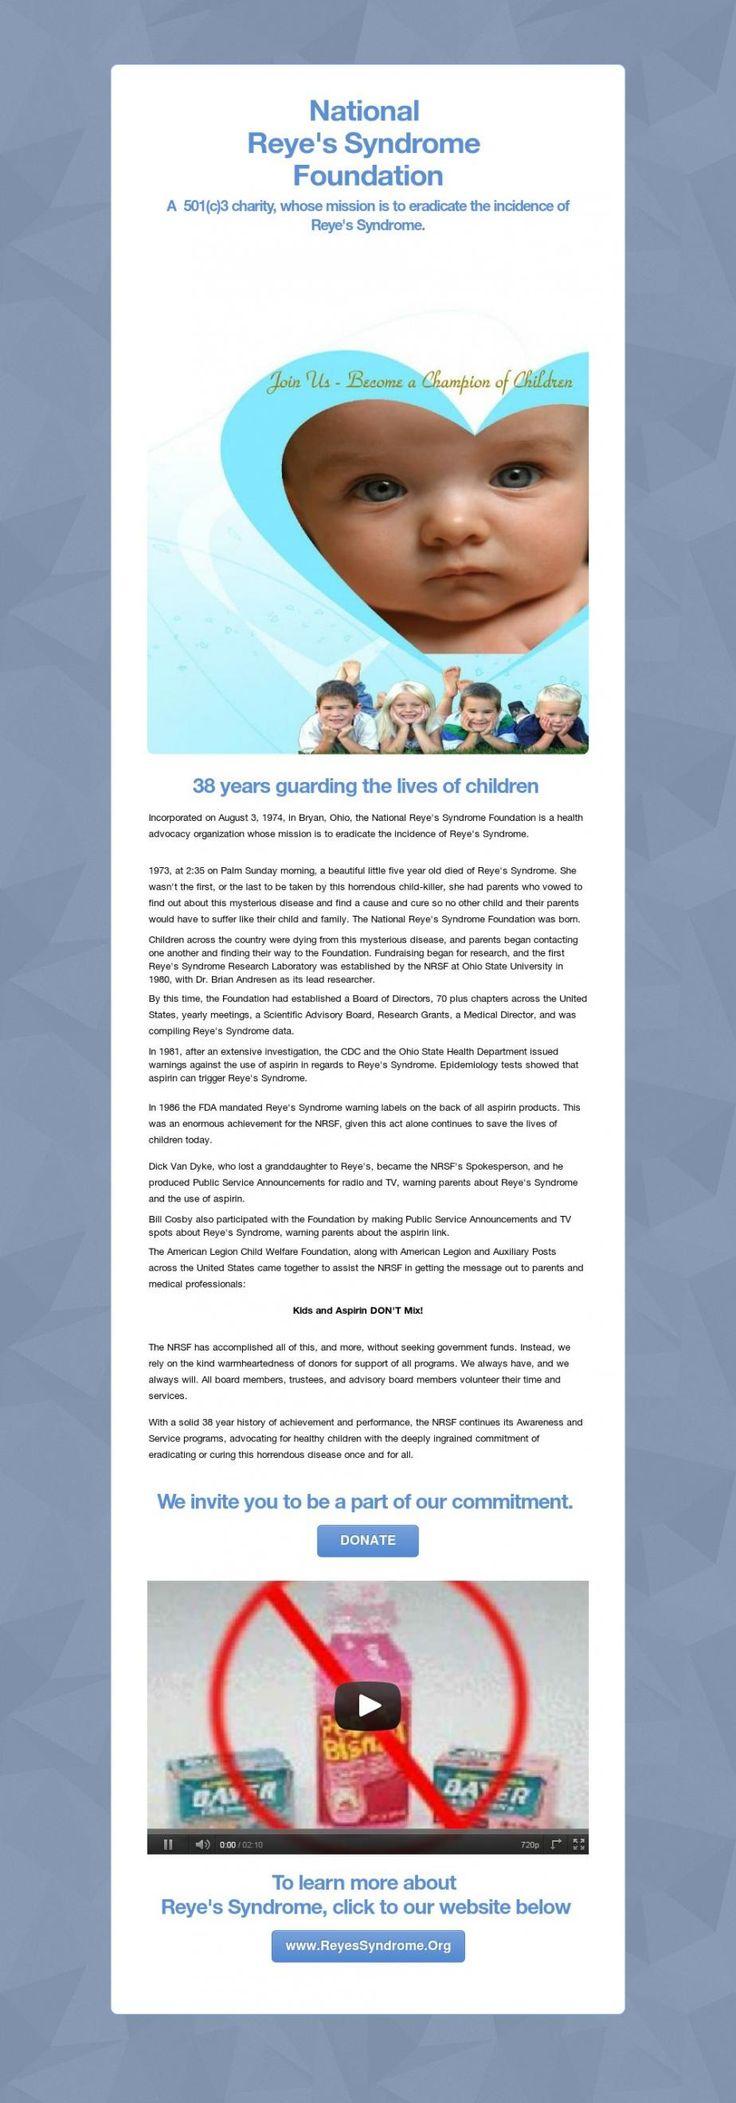 National  Reye's Syndrome  Foundation on Tackk.com